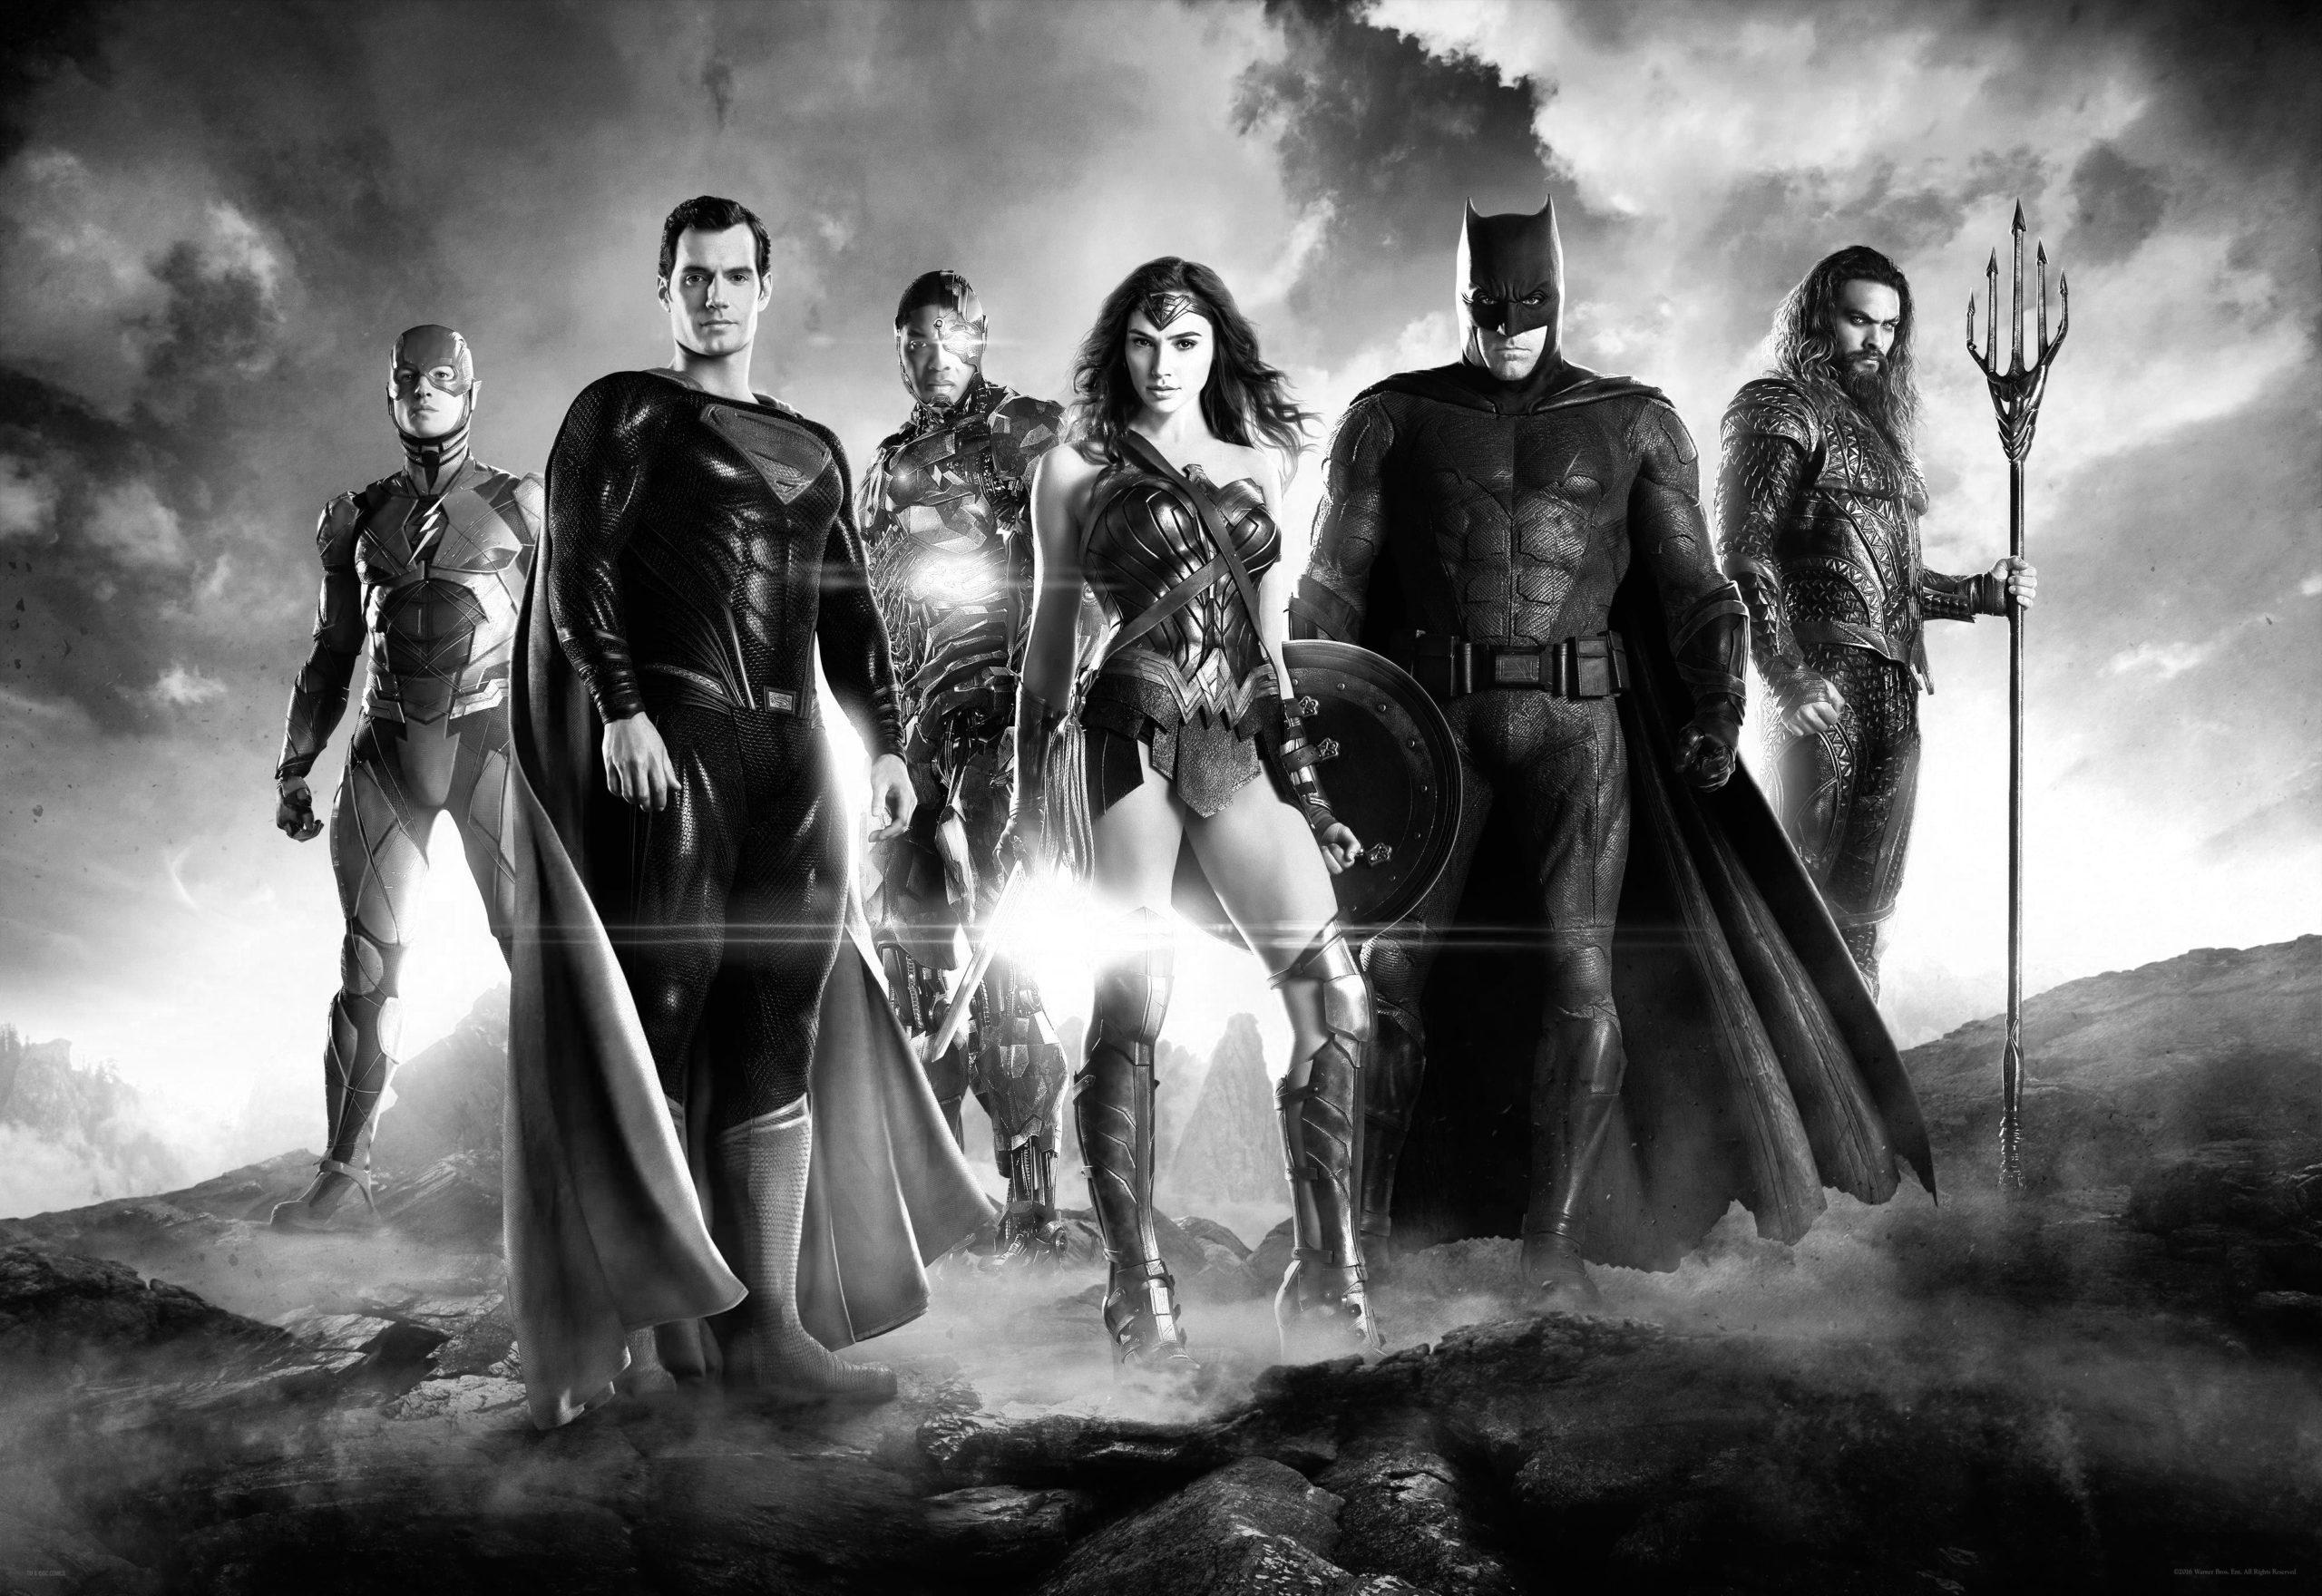 Trailer Trash! – Zack Snyder's Justice League (Trailer 1)